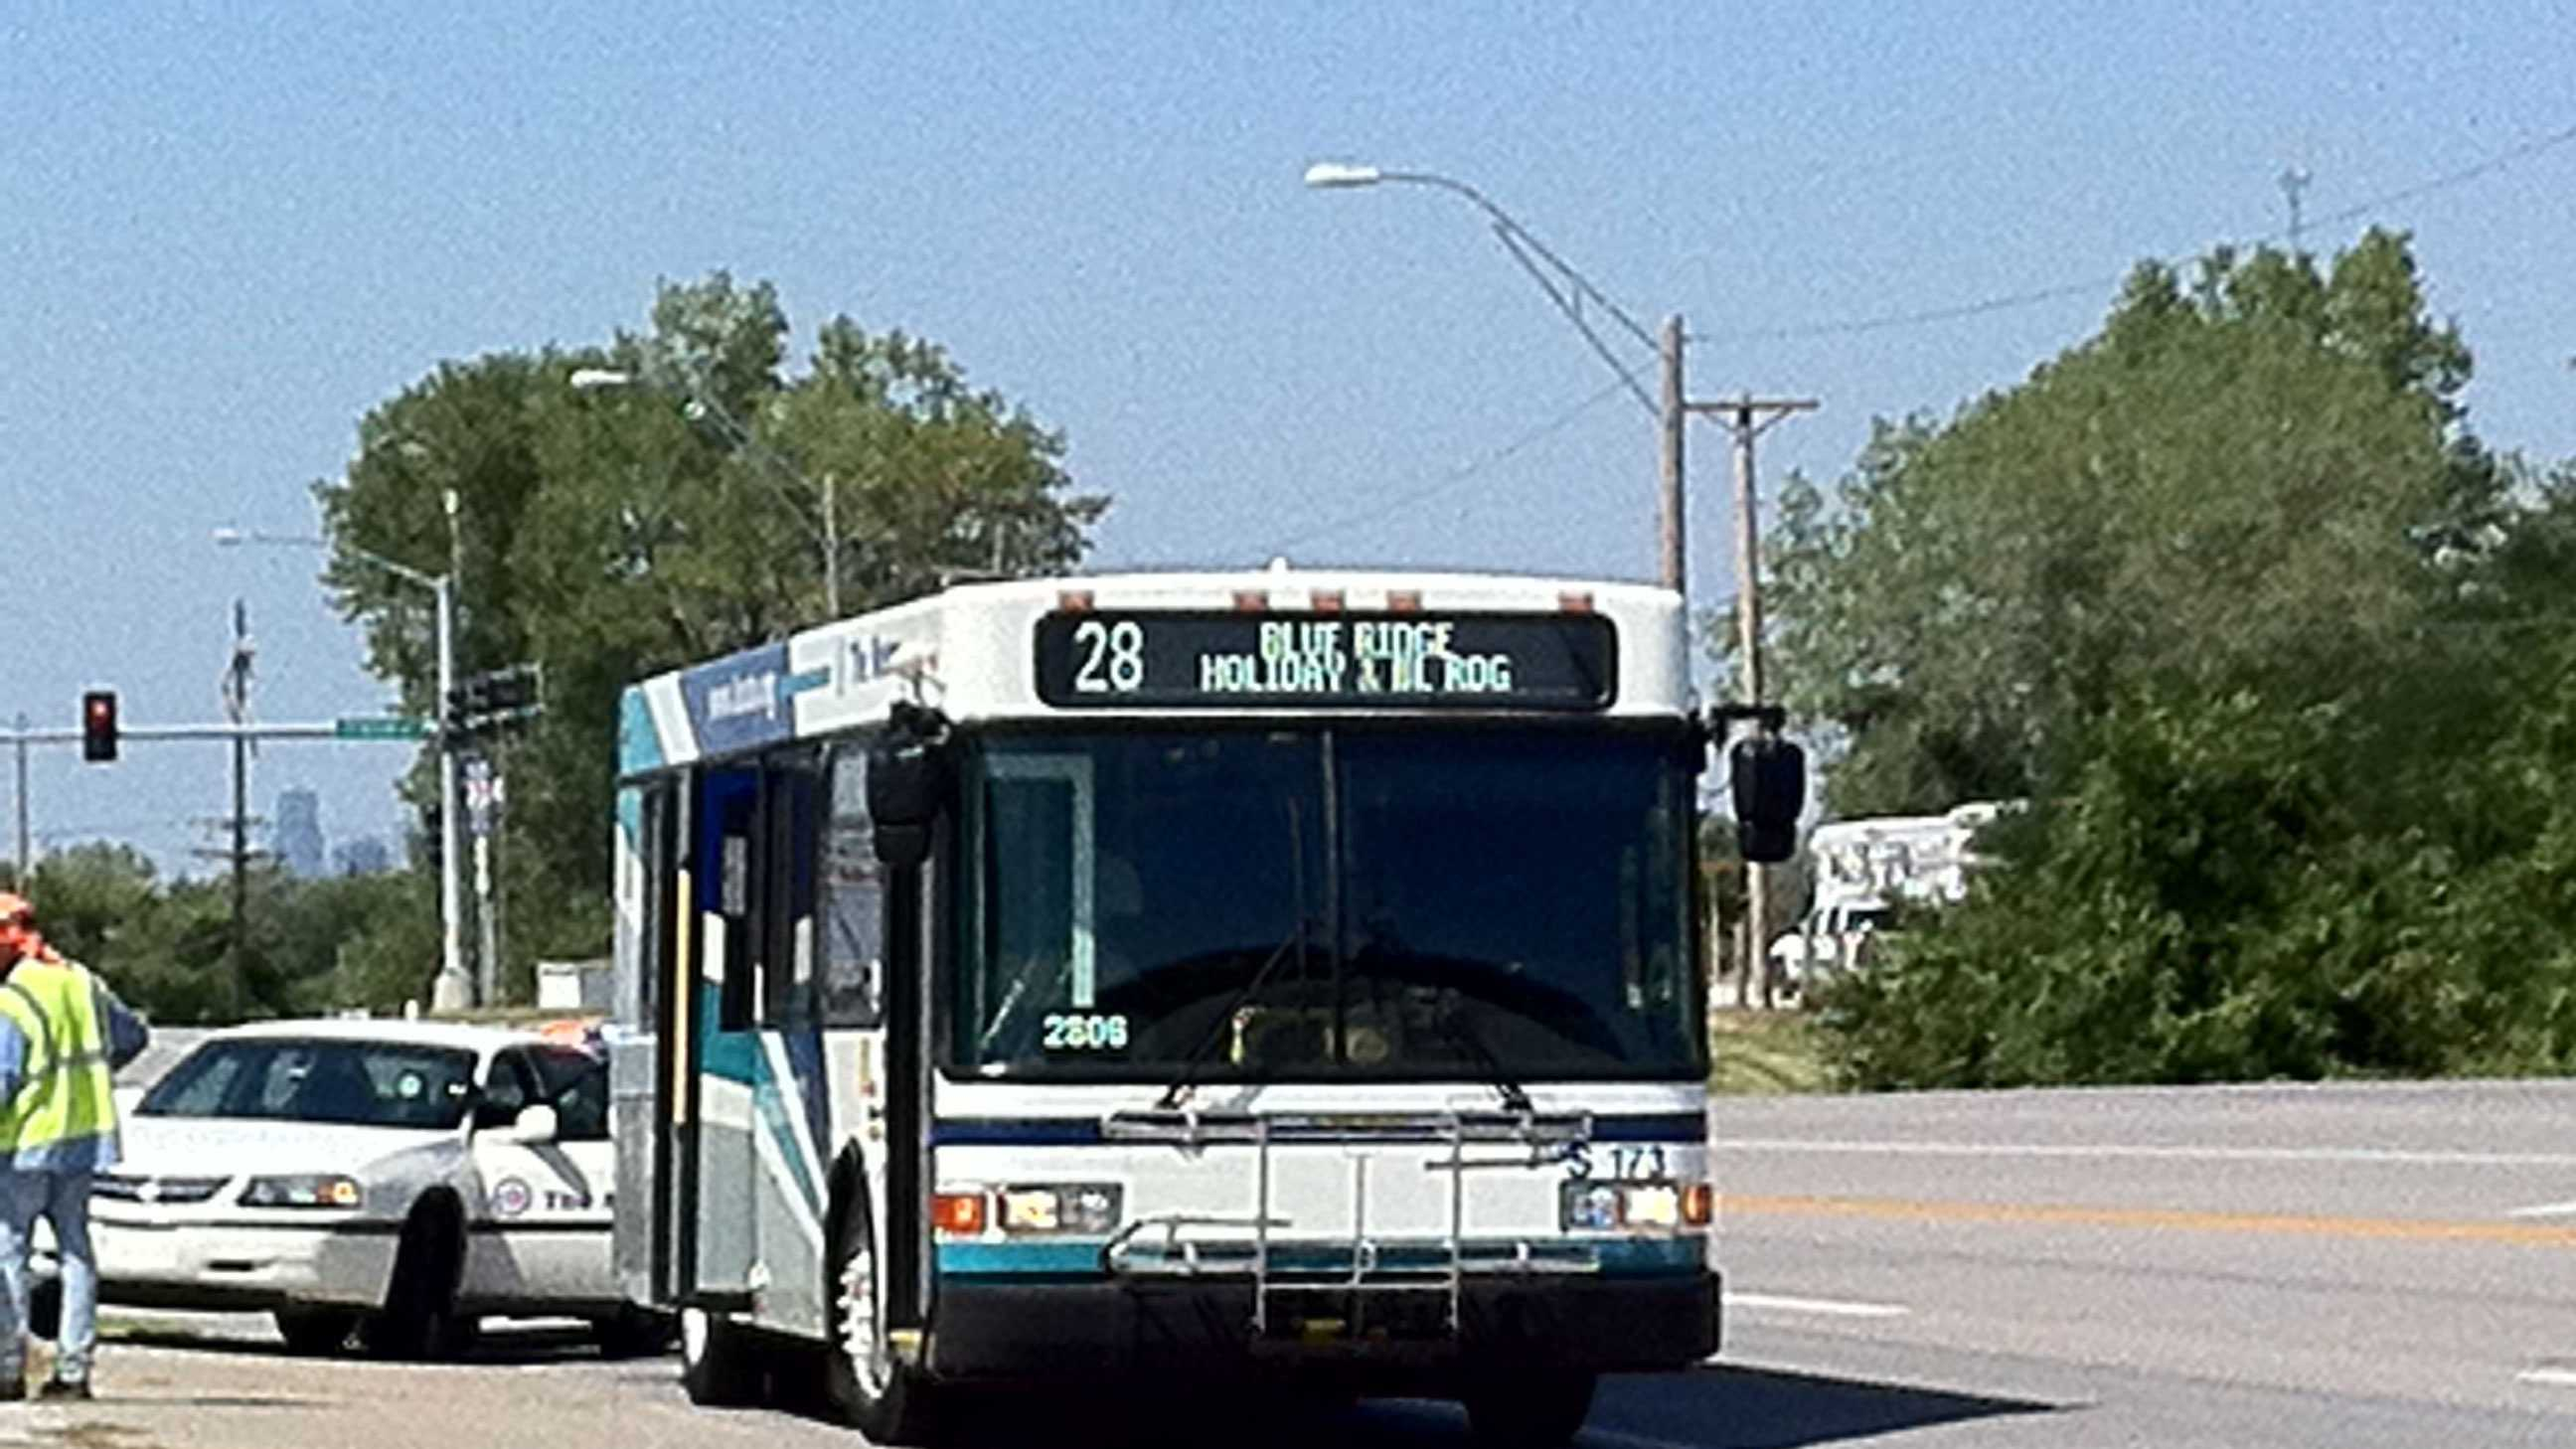 ATA bus assault reported, U.S. 40, Hunter Avenue